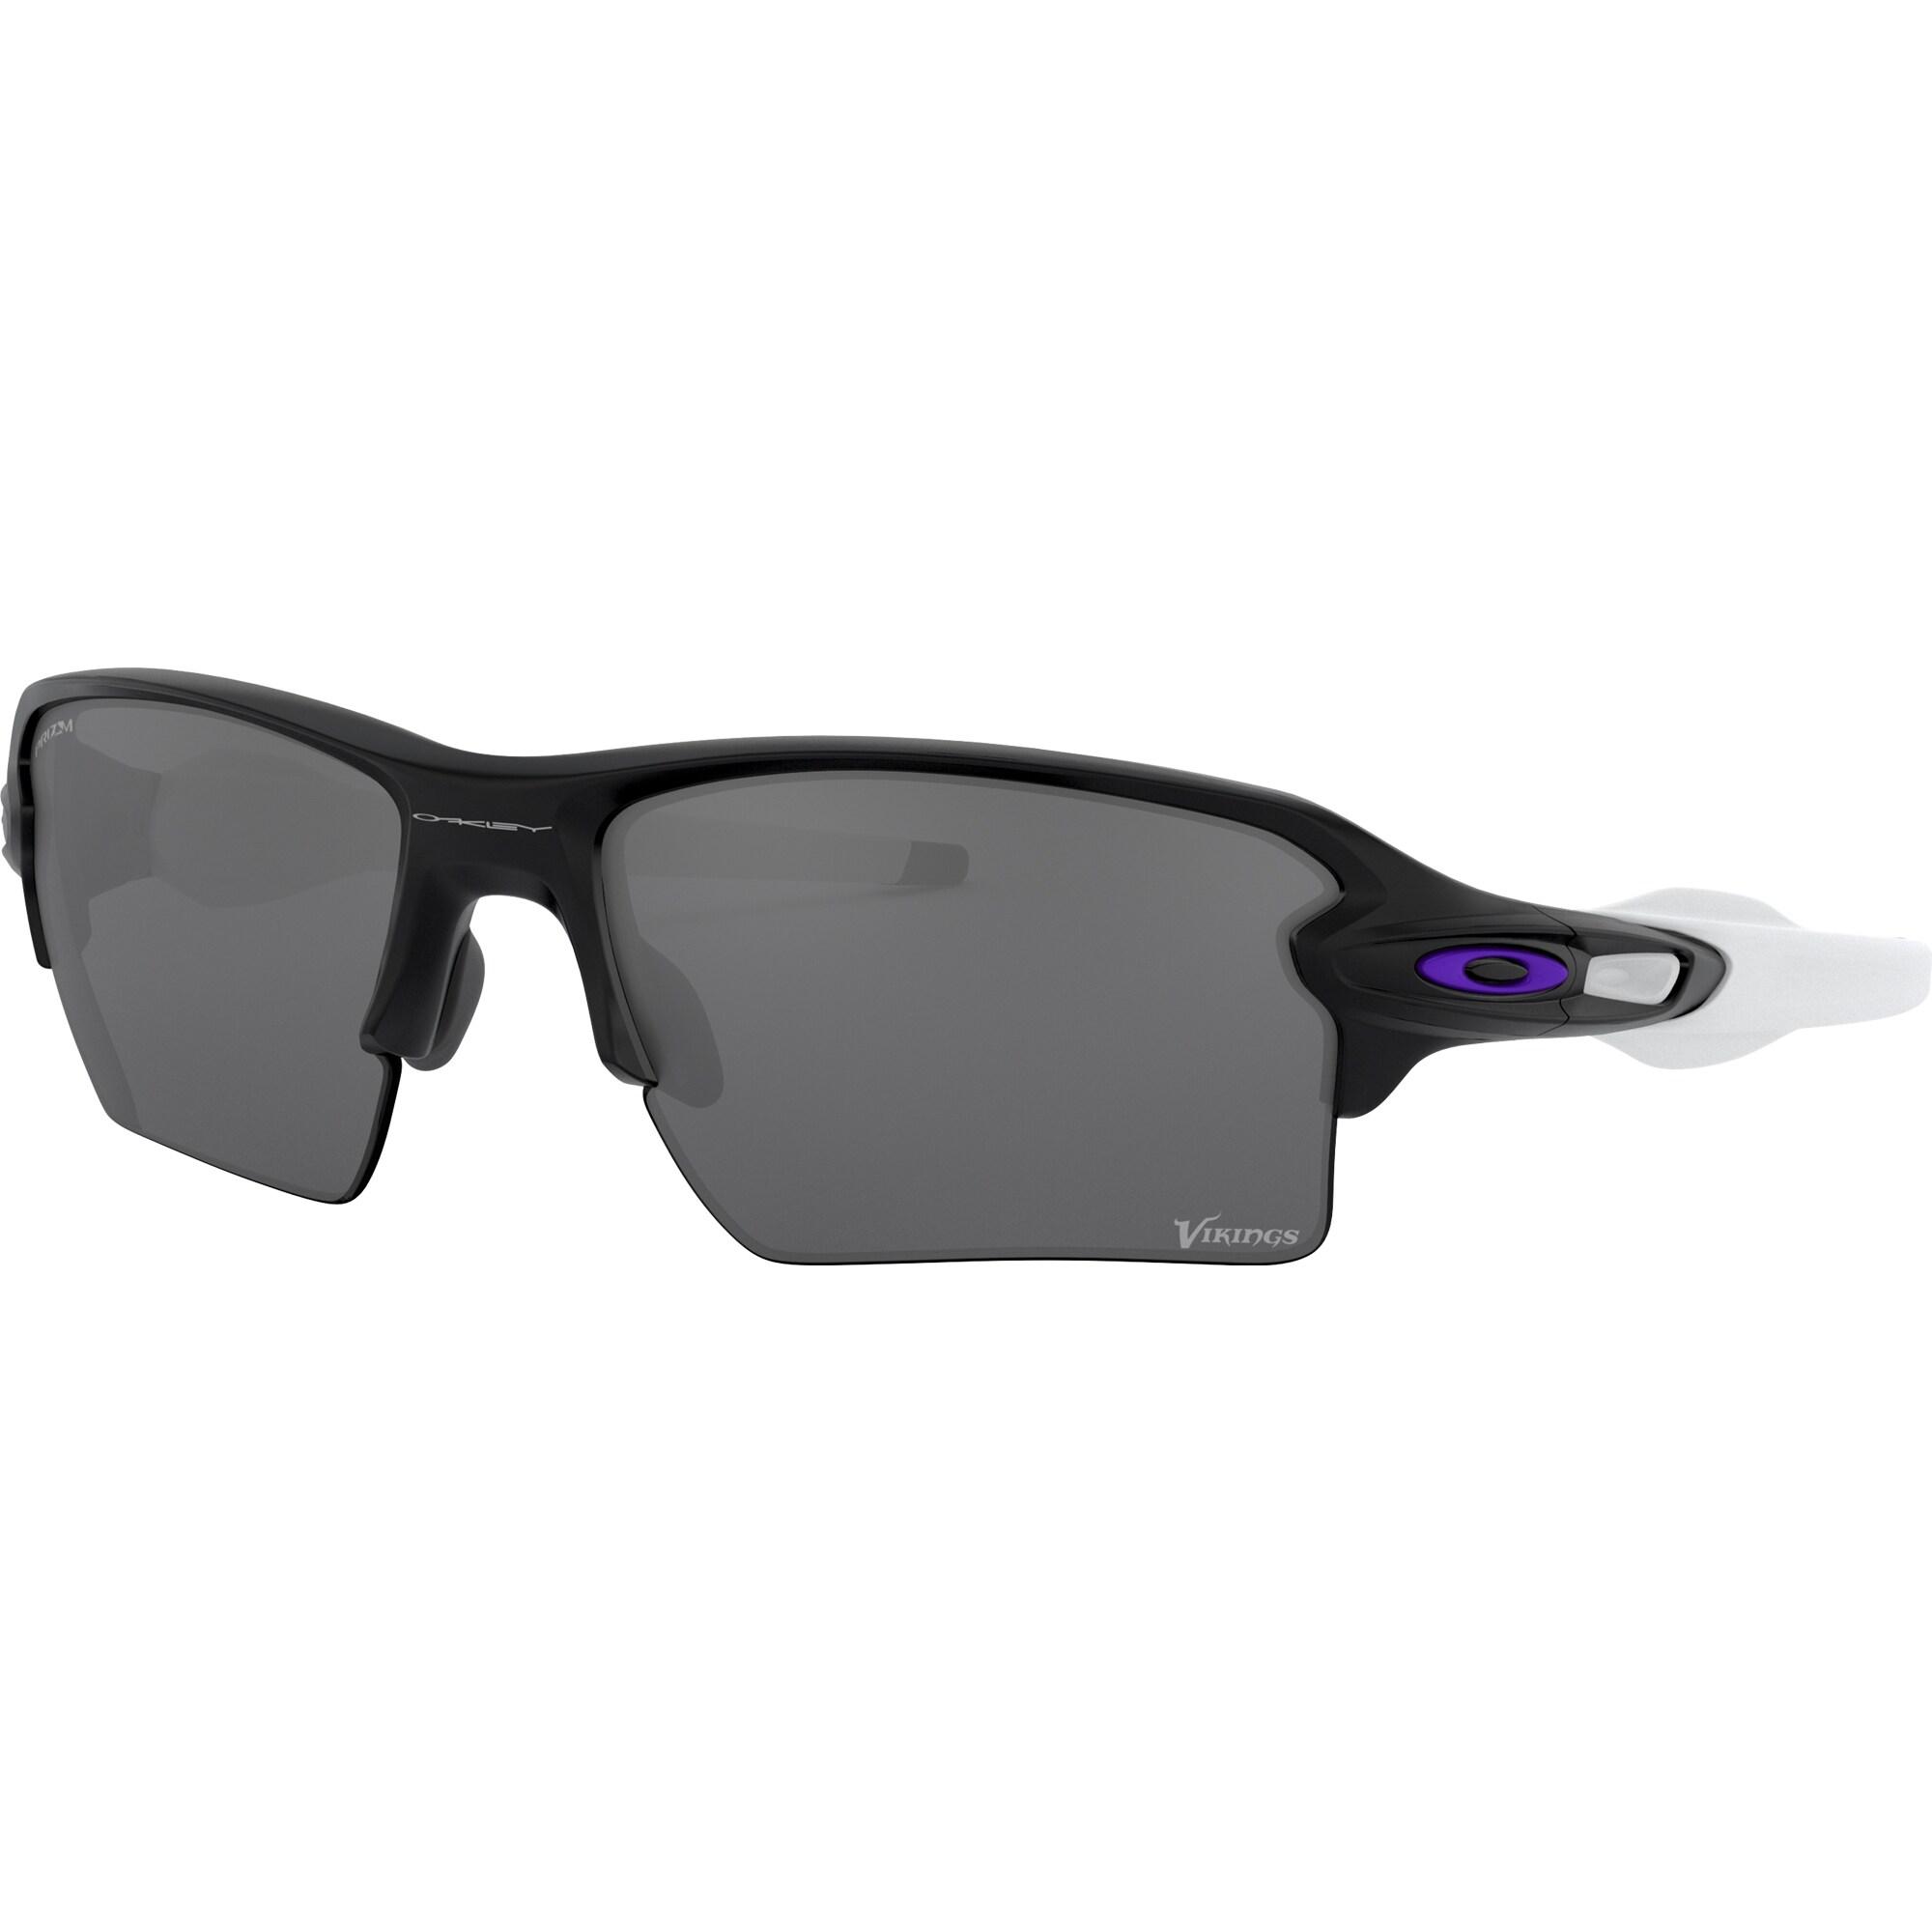 Minnesota Vikings Oakley Flak 2.0 XL Sunglasses